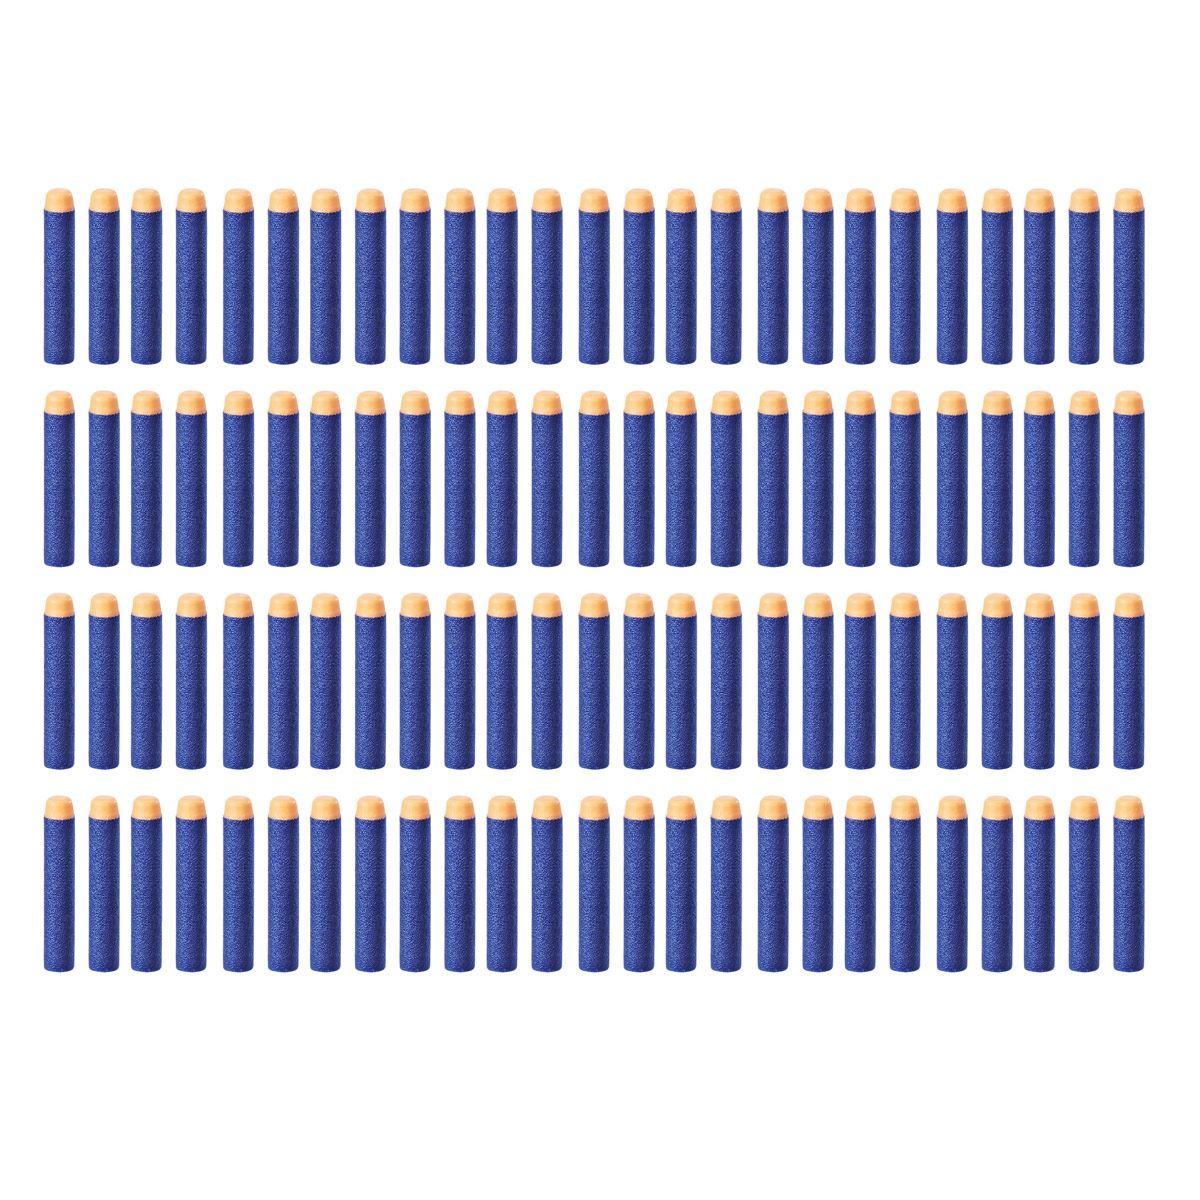 Paquete de 100 dardos Nerf N-Strike Elite